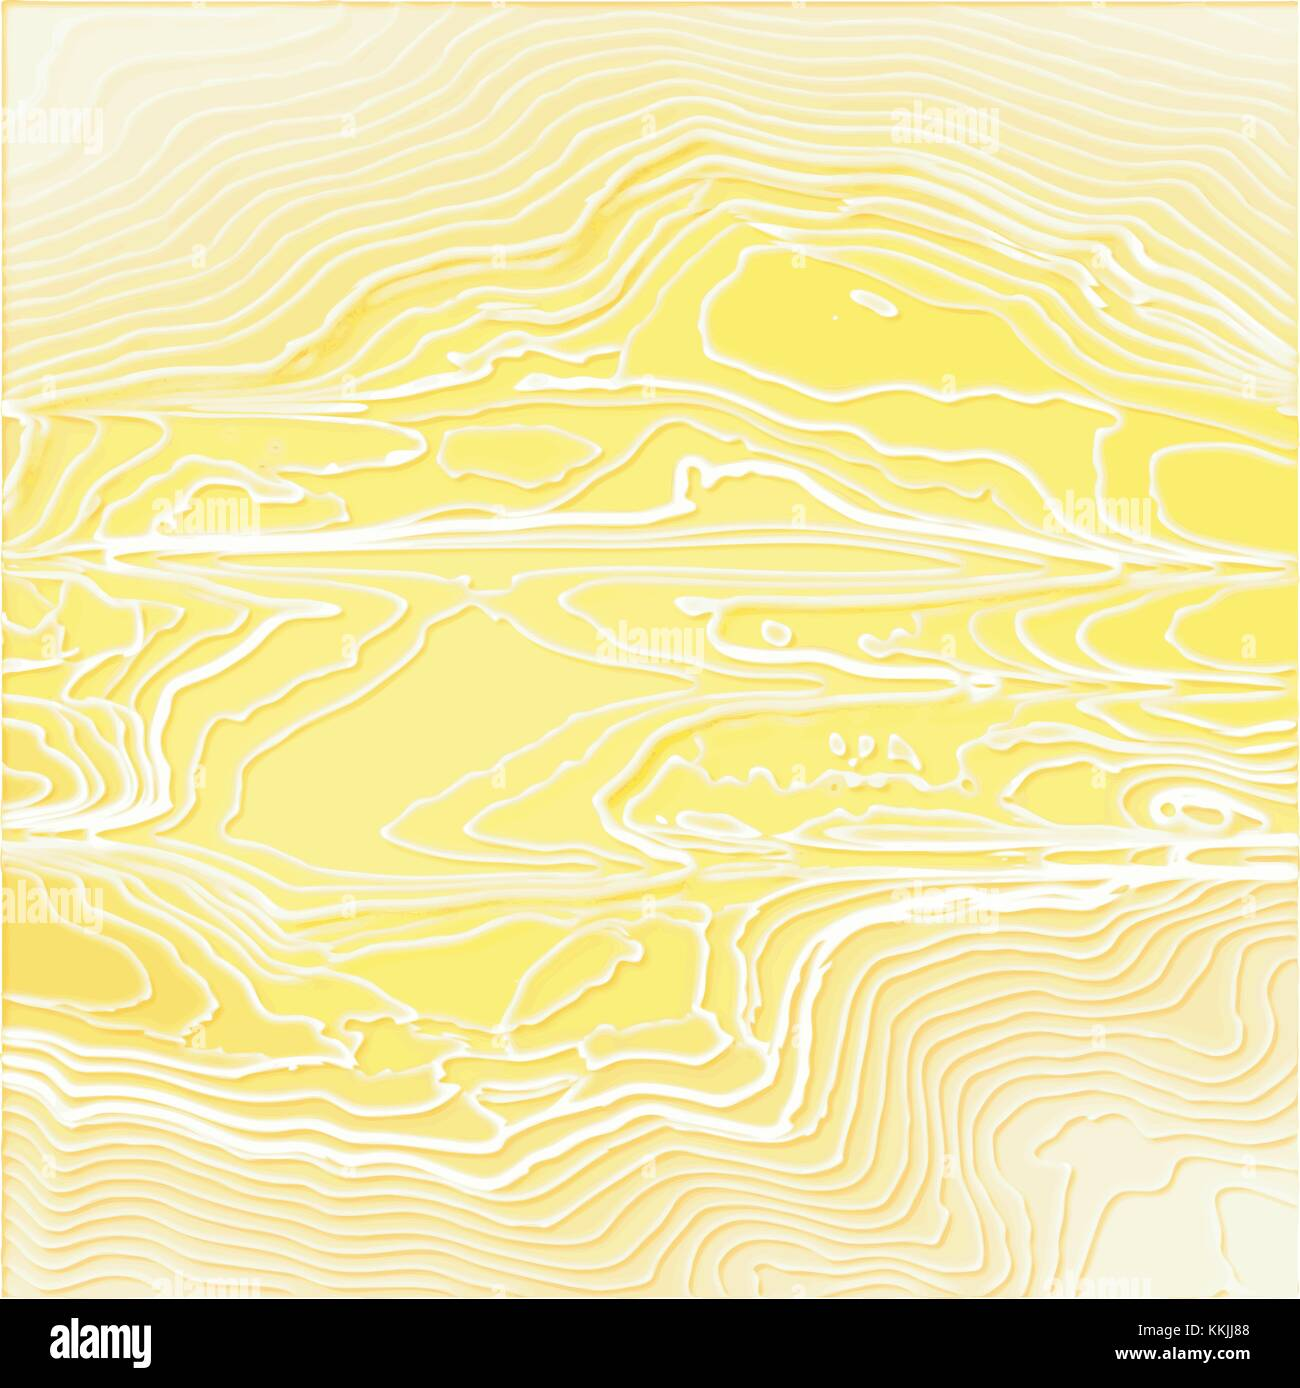 Gelb 3d Papier Schnittmuster mit geschwungenen weißen Linien, Vektor ...